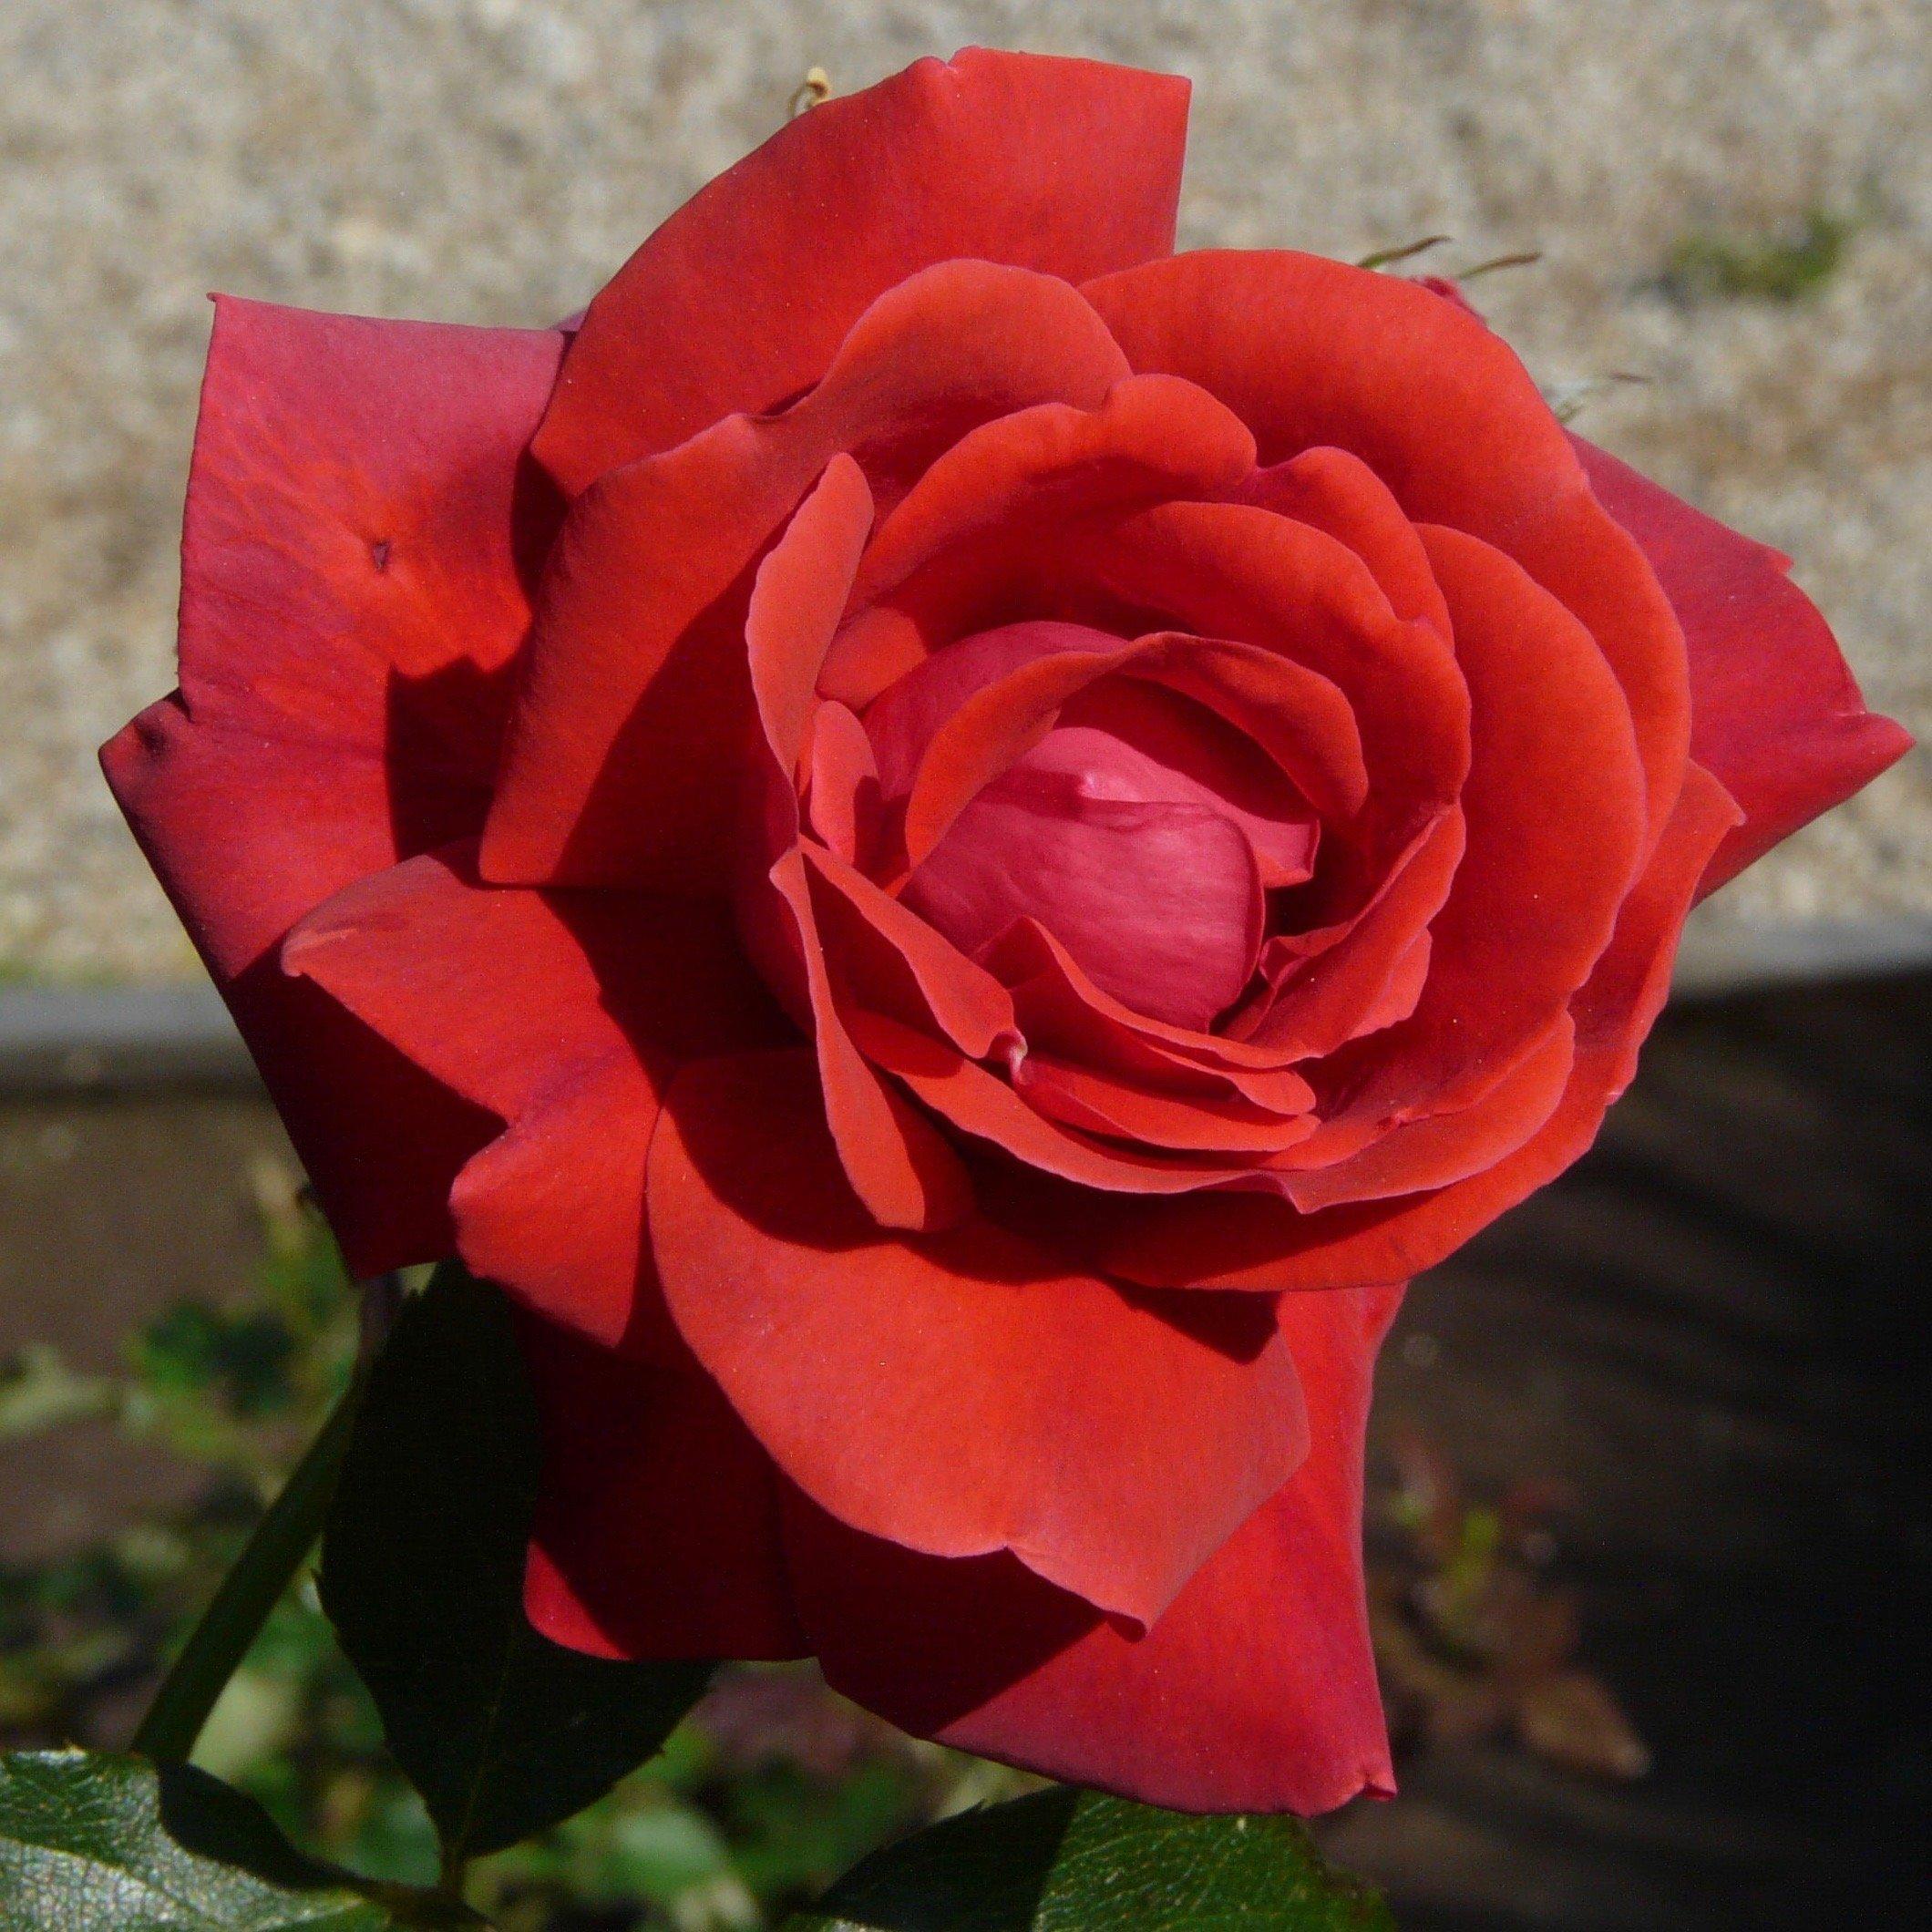 danse du feu a red climbing rose